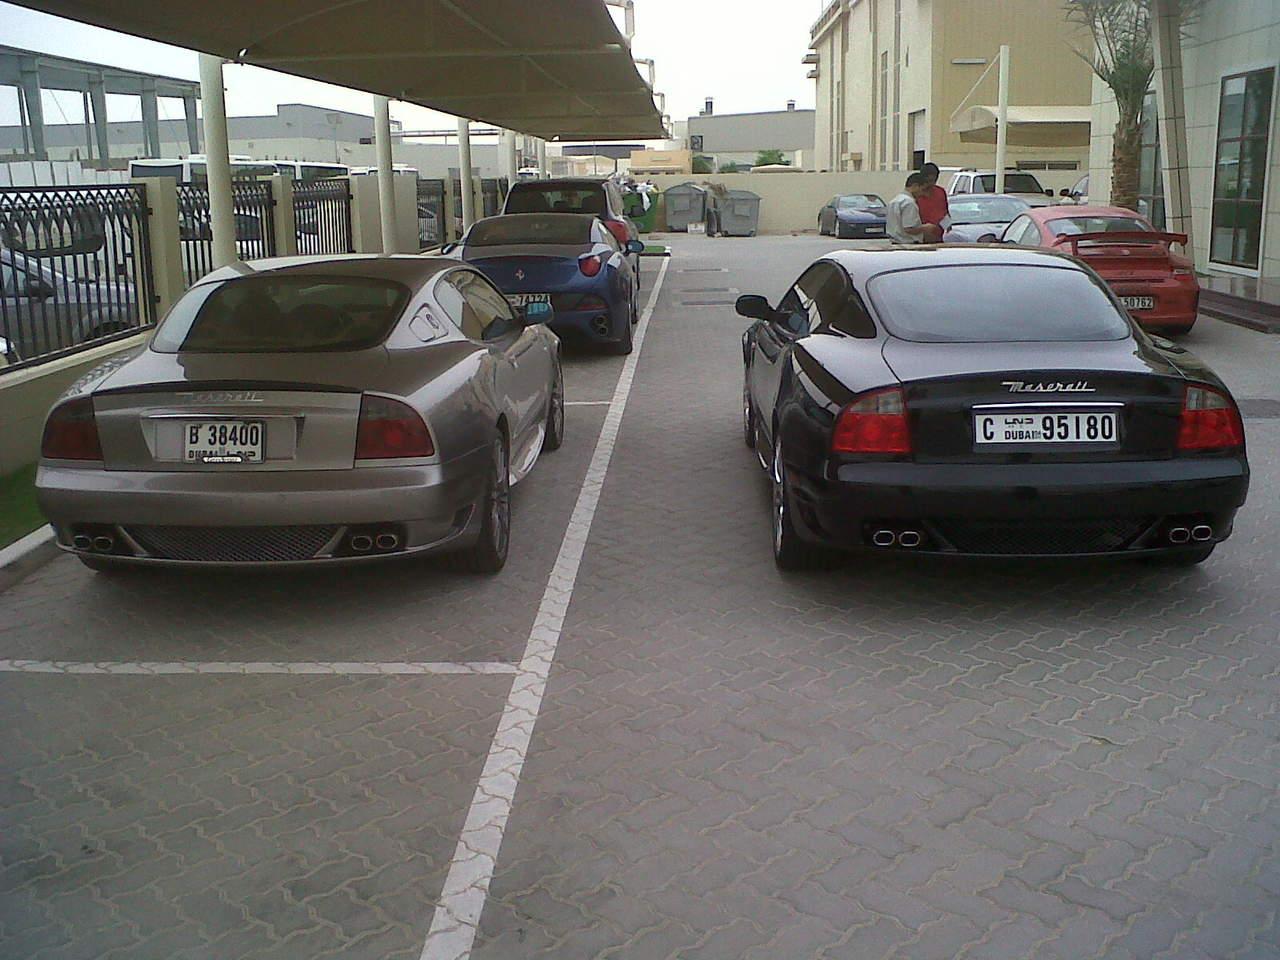 GS LE & MCV in Dubai-img01732-20120417-1619.jpg